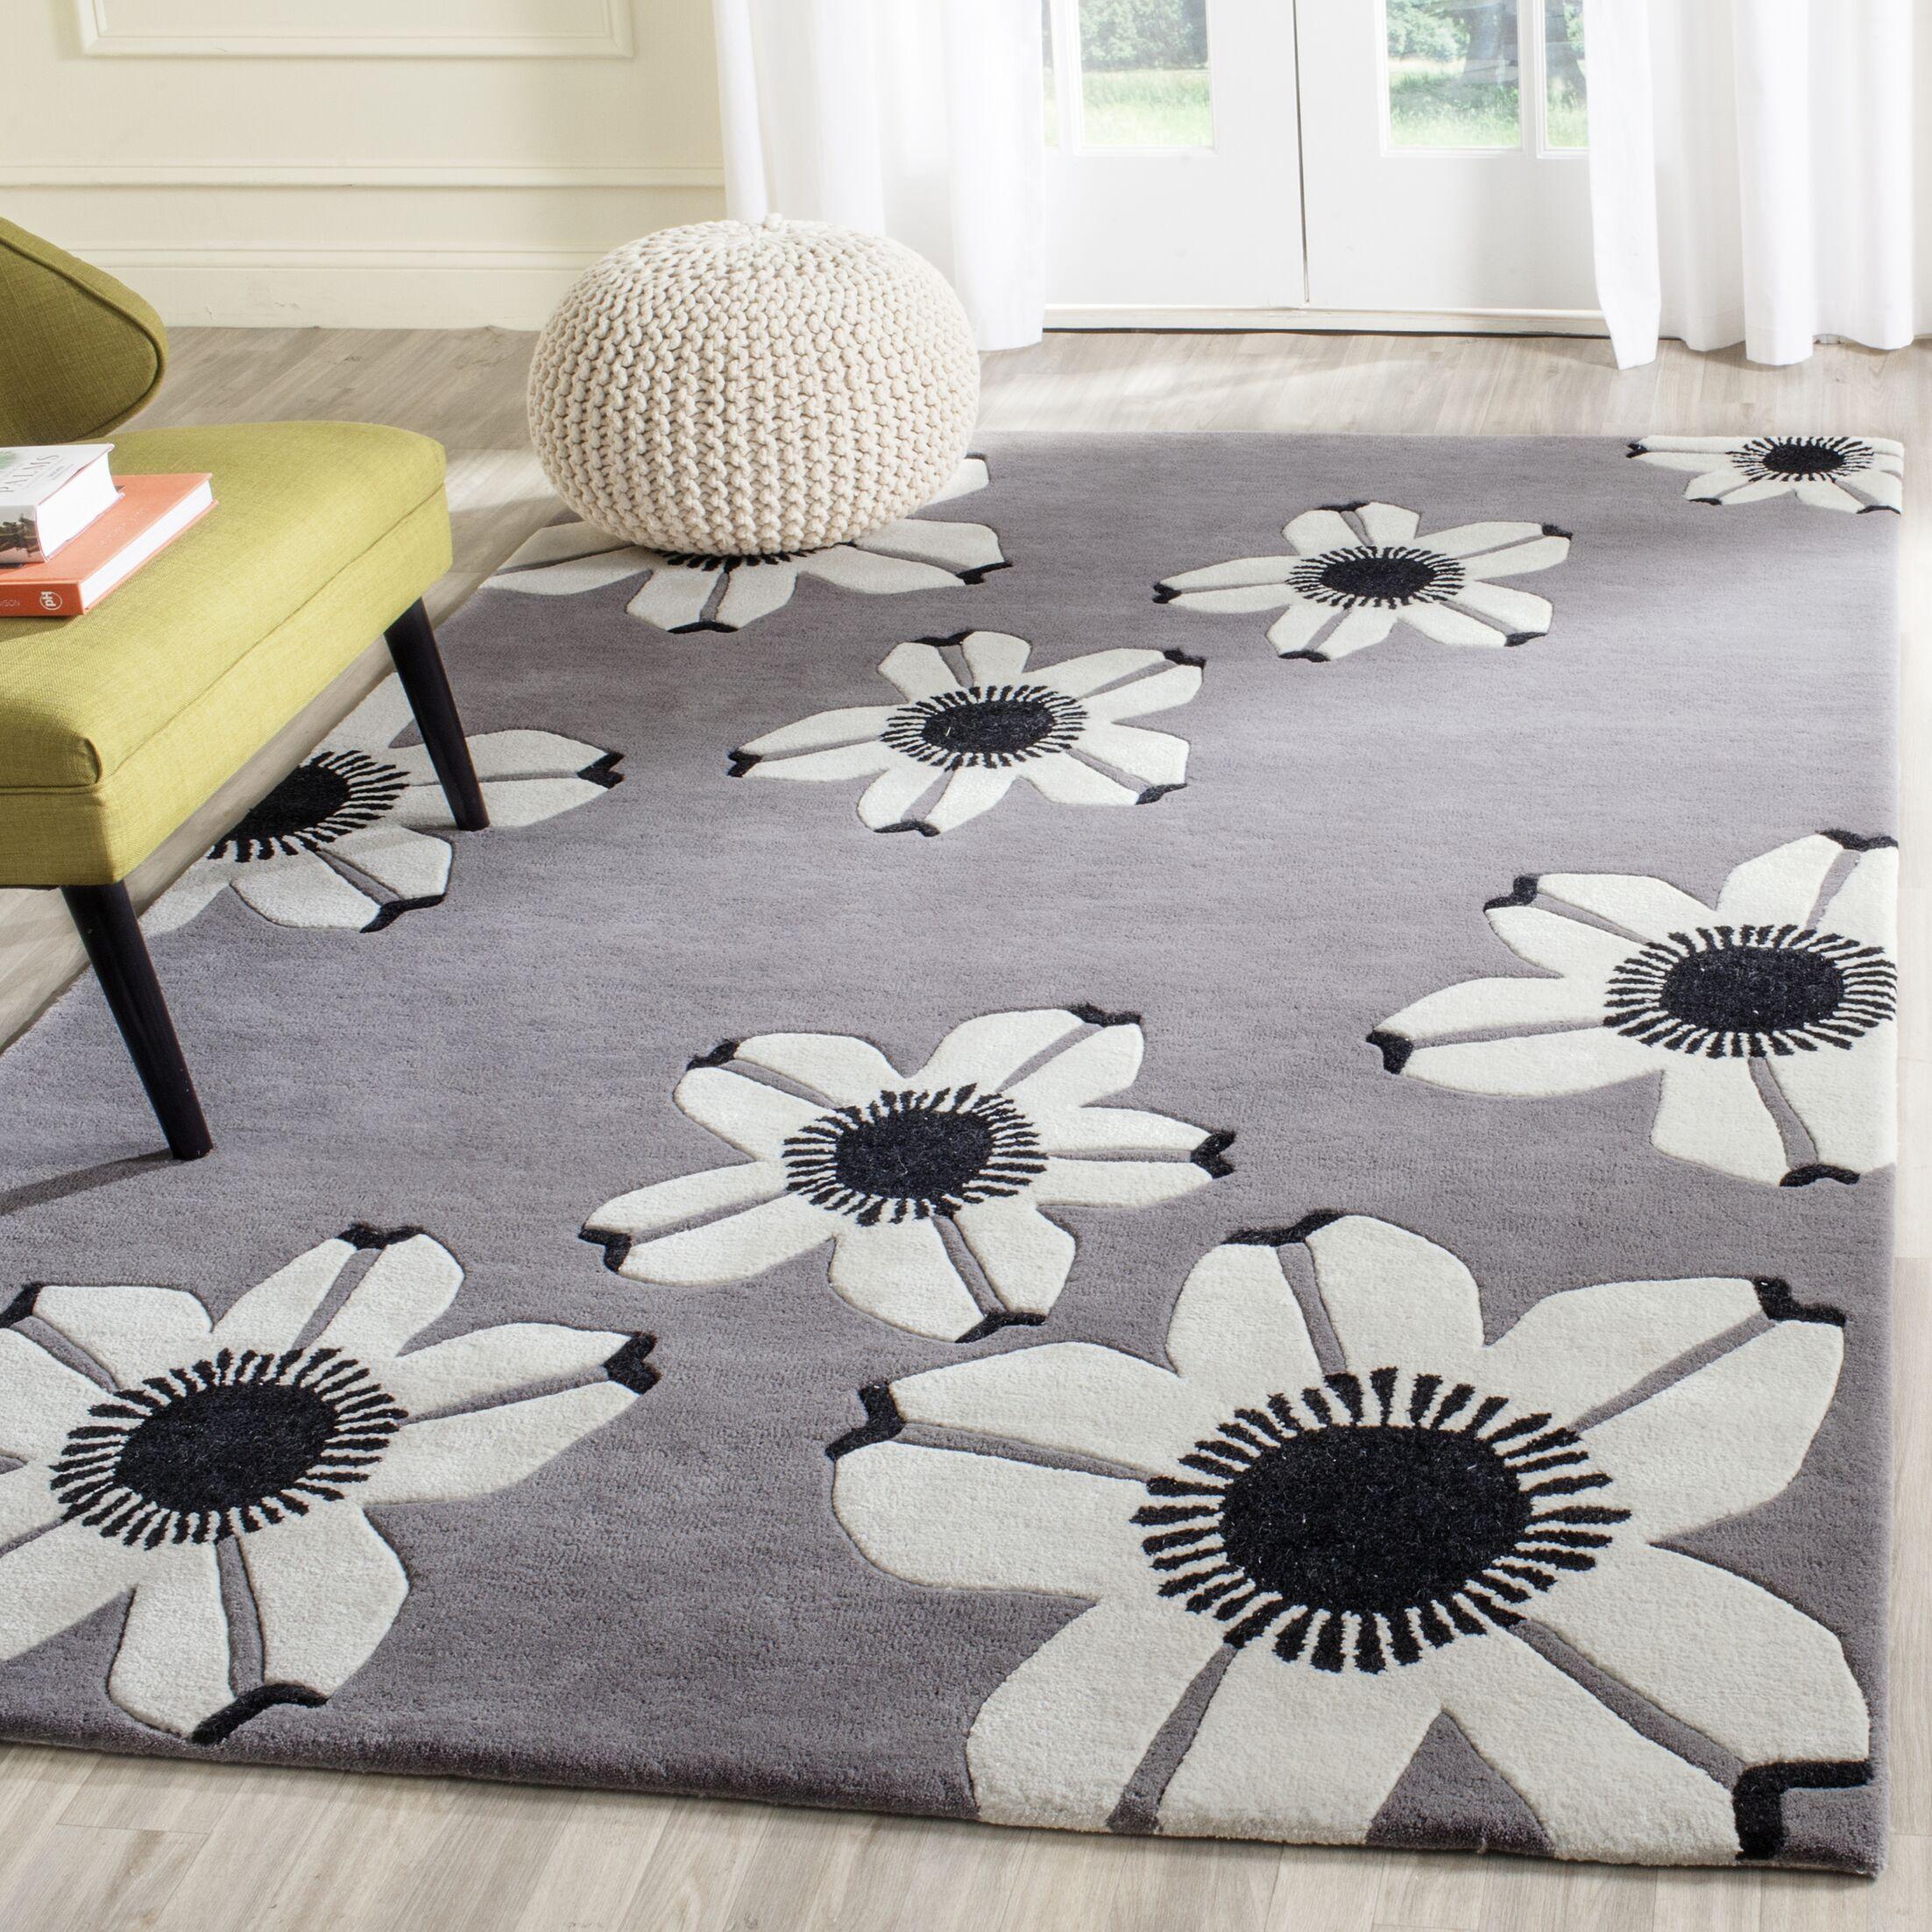 Vasilia Gray Area Rug Rug Size: Rectangle 8' x 10'